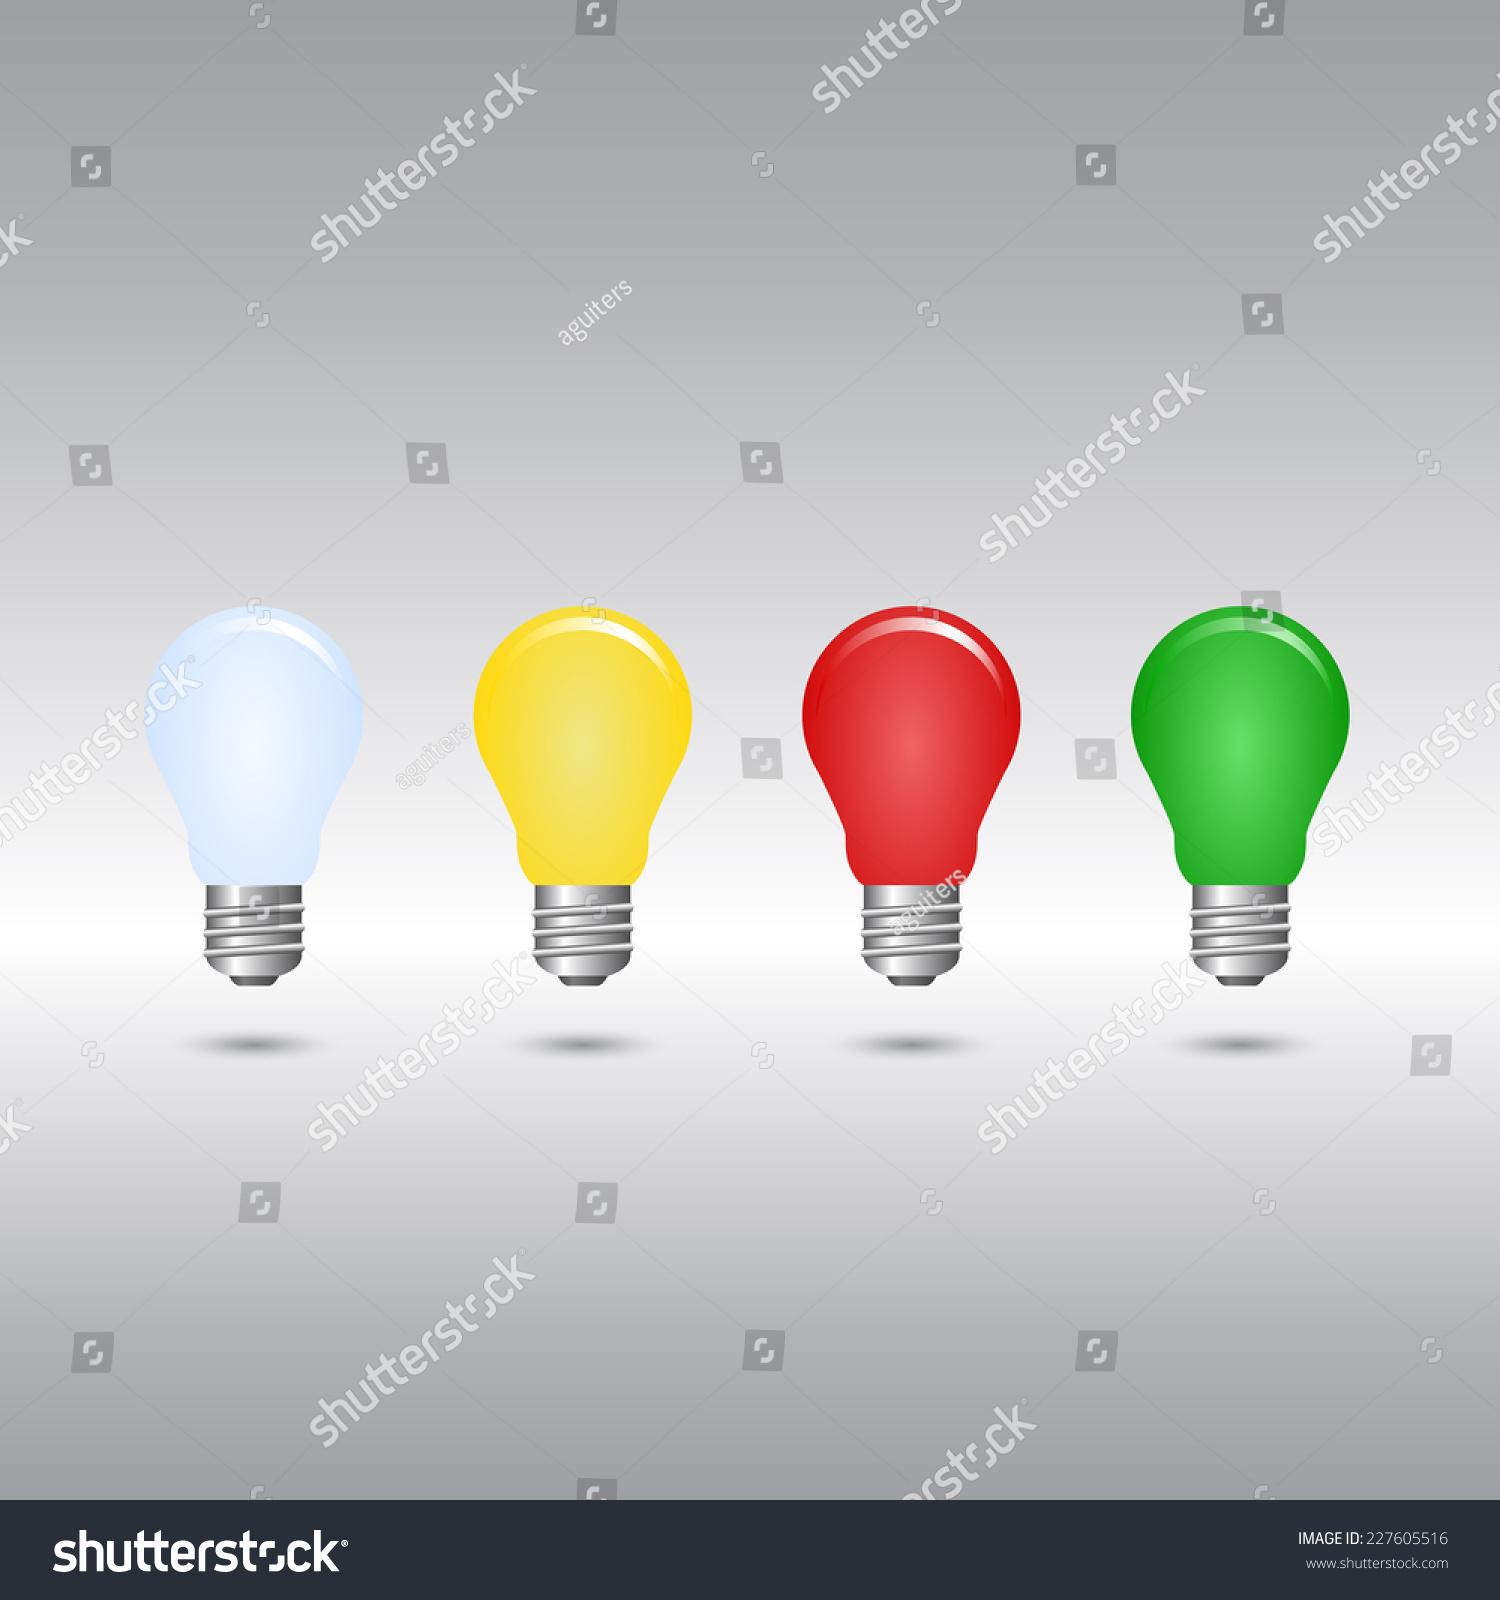 colored light bulbs - Colored Light Bulbs